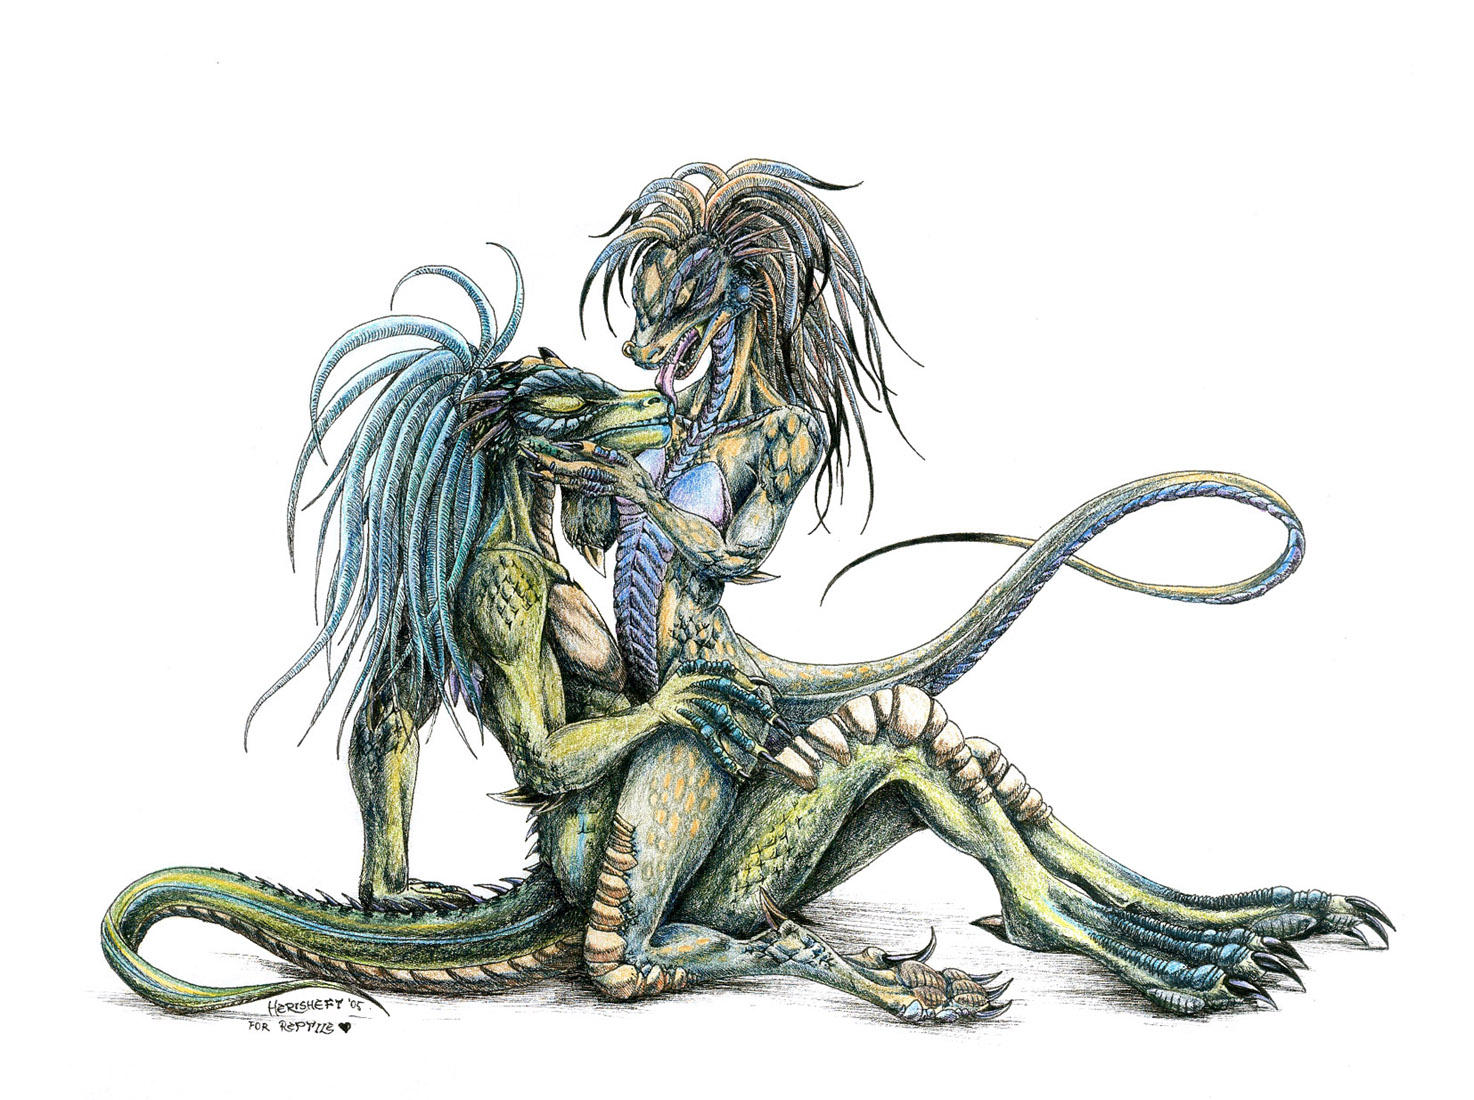 Фурри ящерица дракон 30 фотография